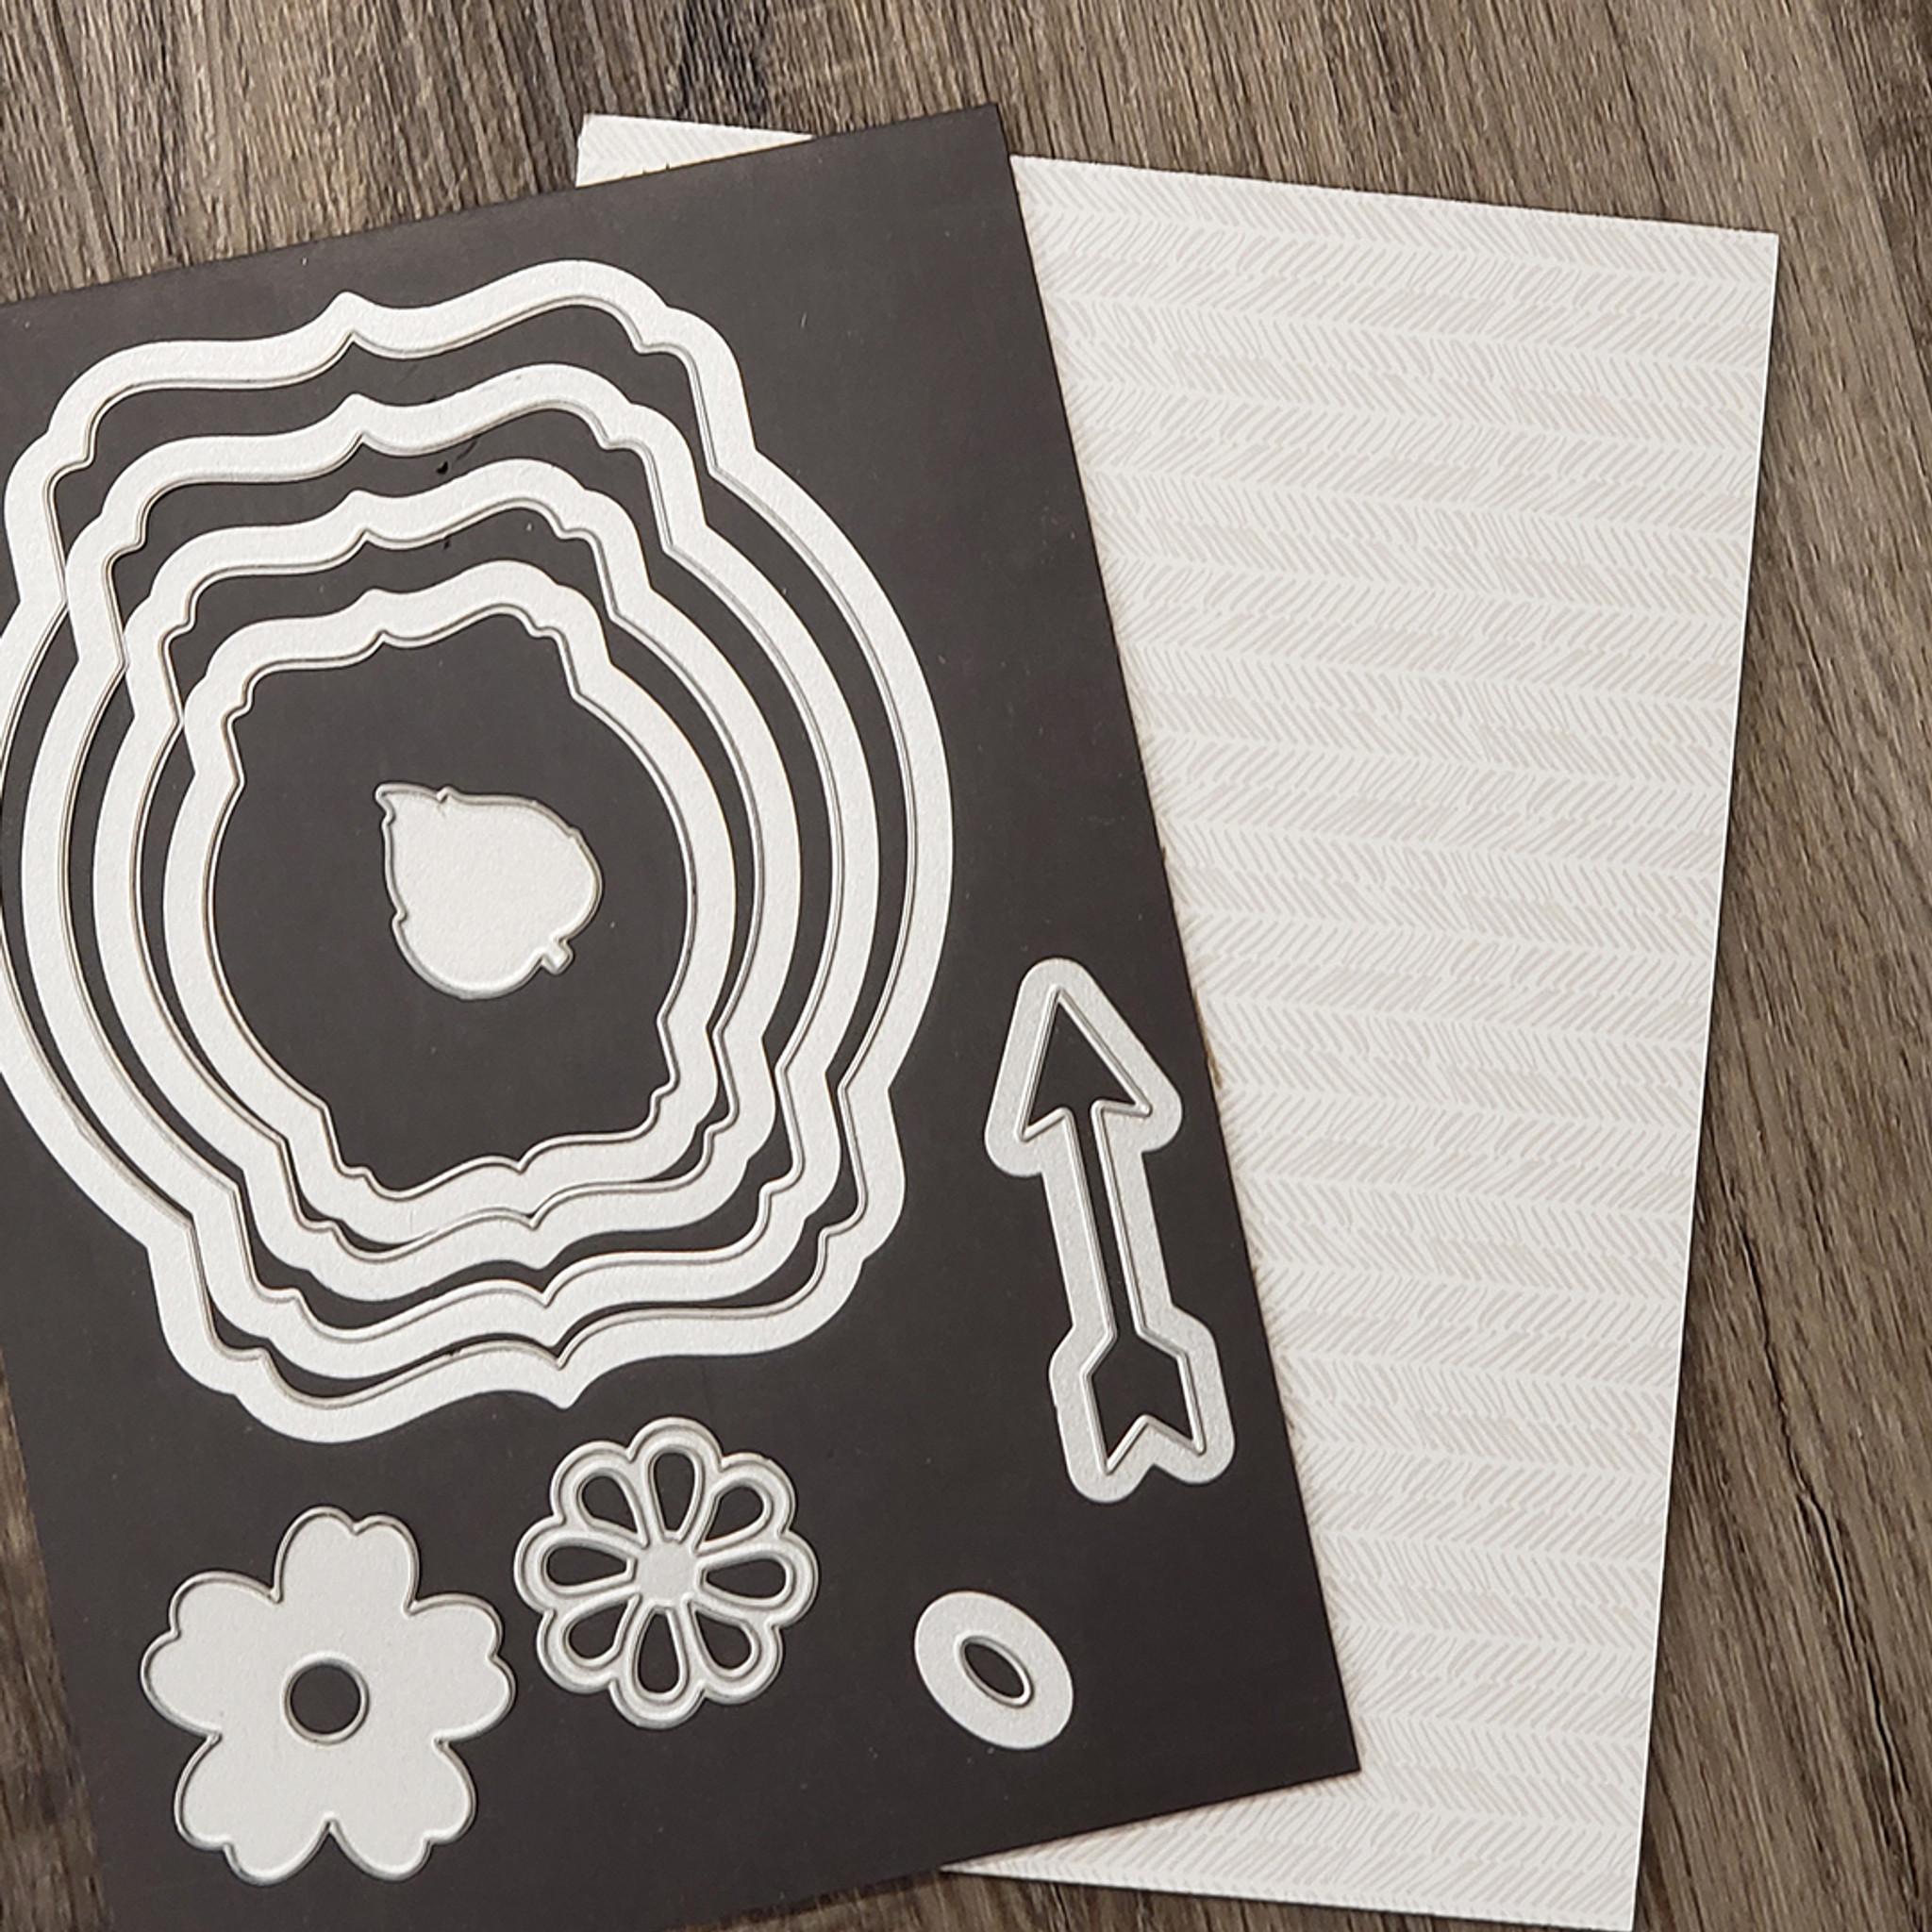 Cutting Die Transport by First Edition Craft Steel Dies Set 7 die per set with free magnetic storage sheet Card Making Paper Craft